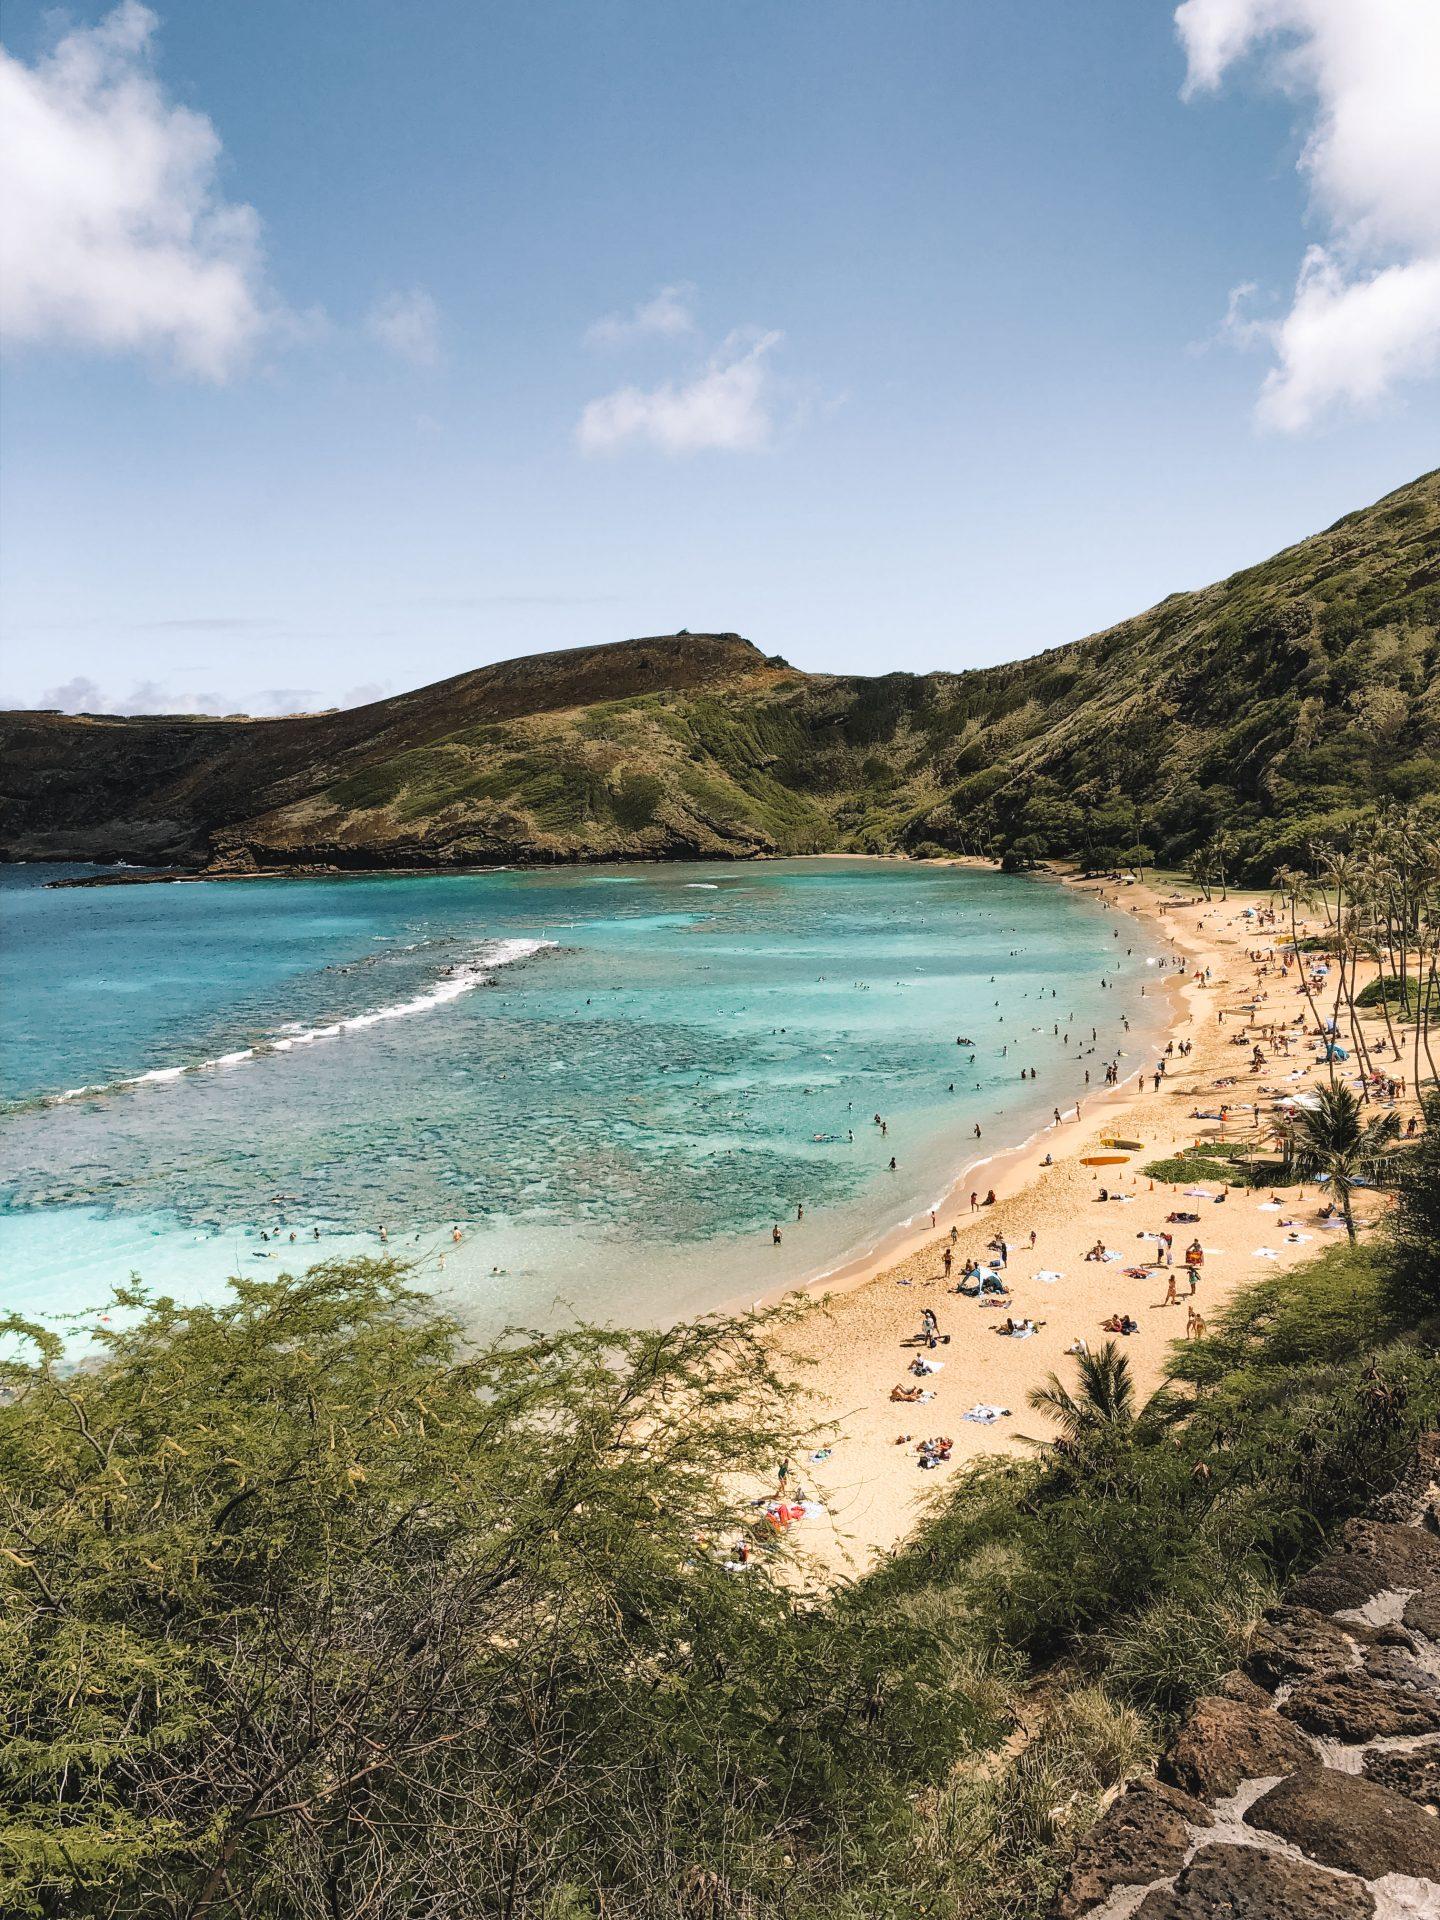 Snorkeling Hanauma Bay Hawaii - Blondie Baby blog mode et voyages